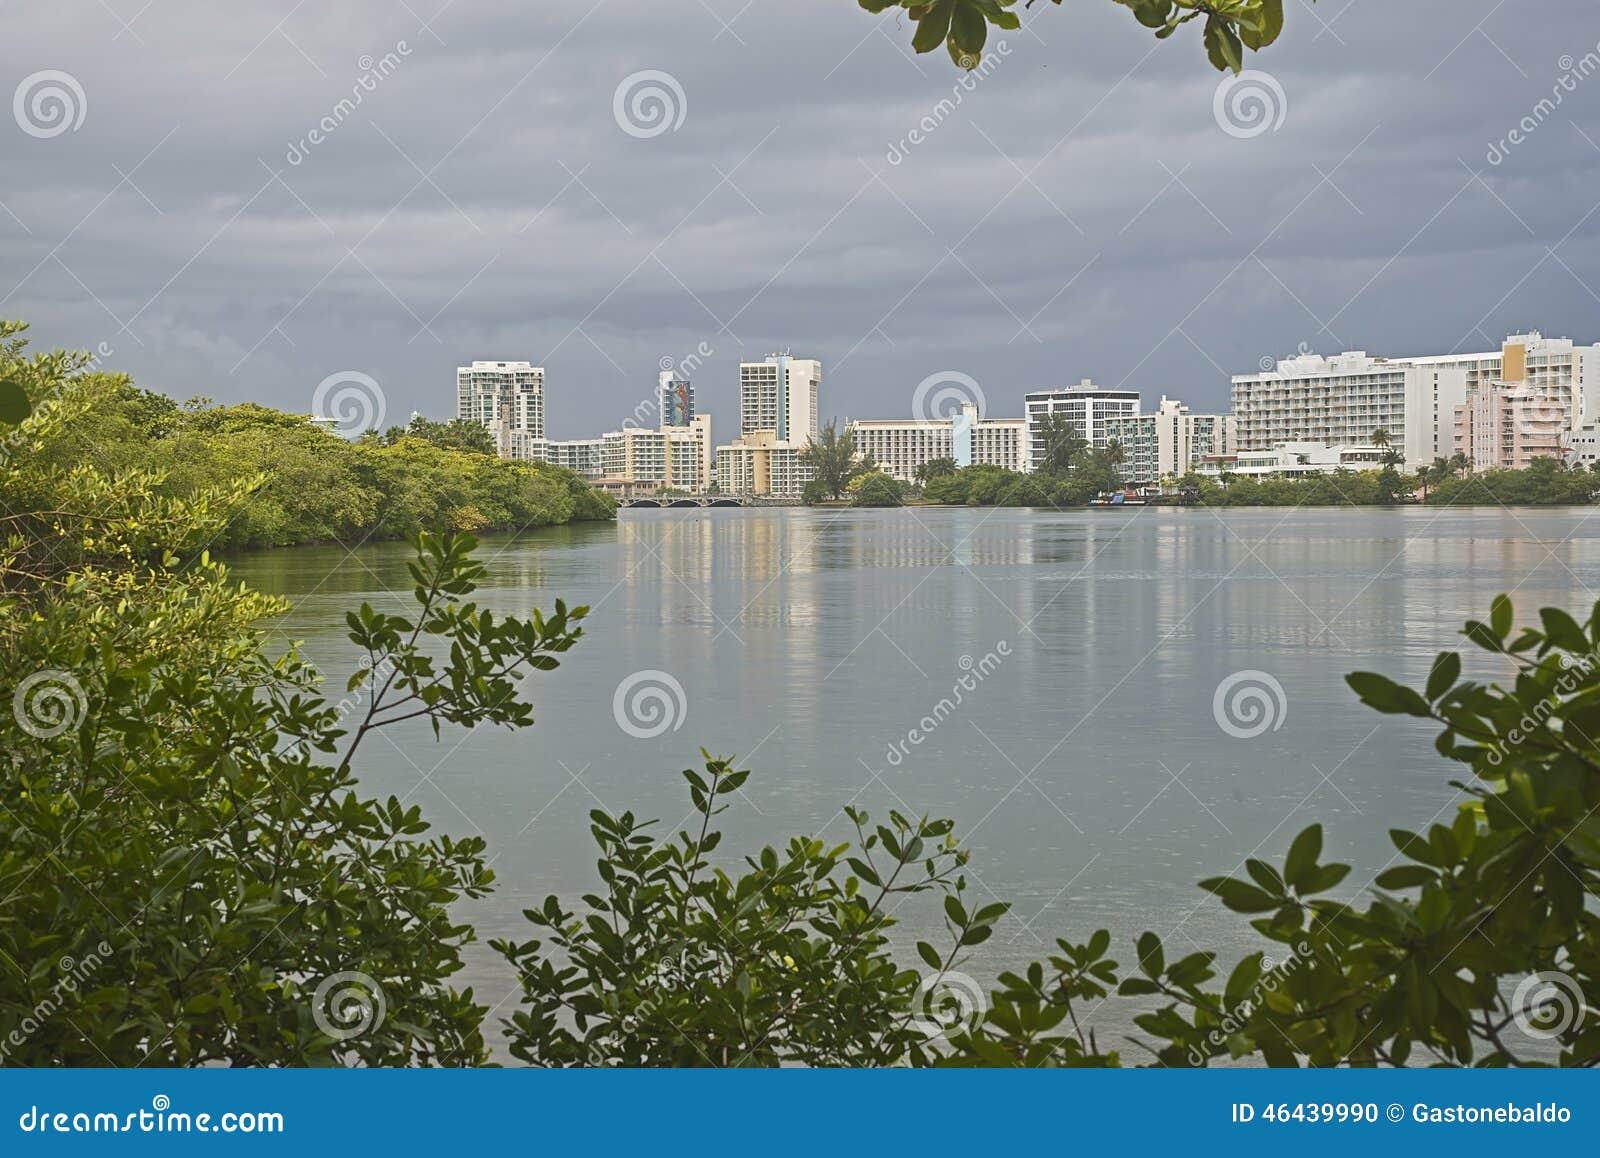 Condado lagoon, San Juan, Puerto Rico